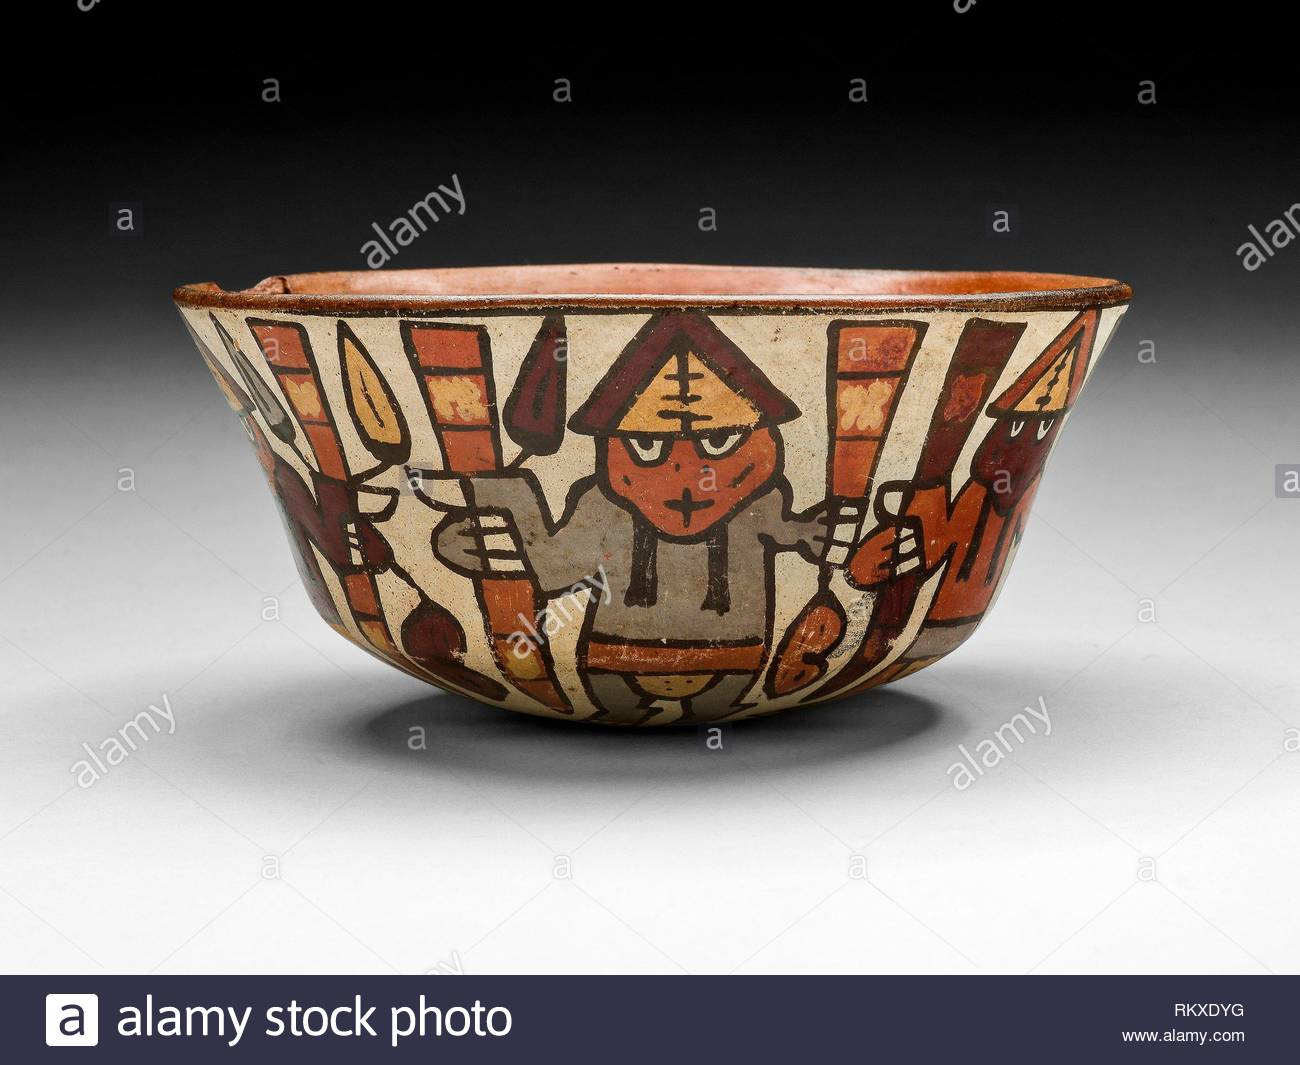 bowl depicting a harvest dance 180 bcad 500 nazca south coast peru artist nazca origin peru date 180 bc500 ad medium ceramic and RKXDYG